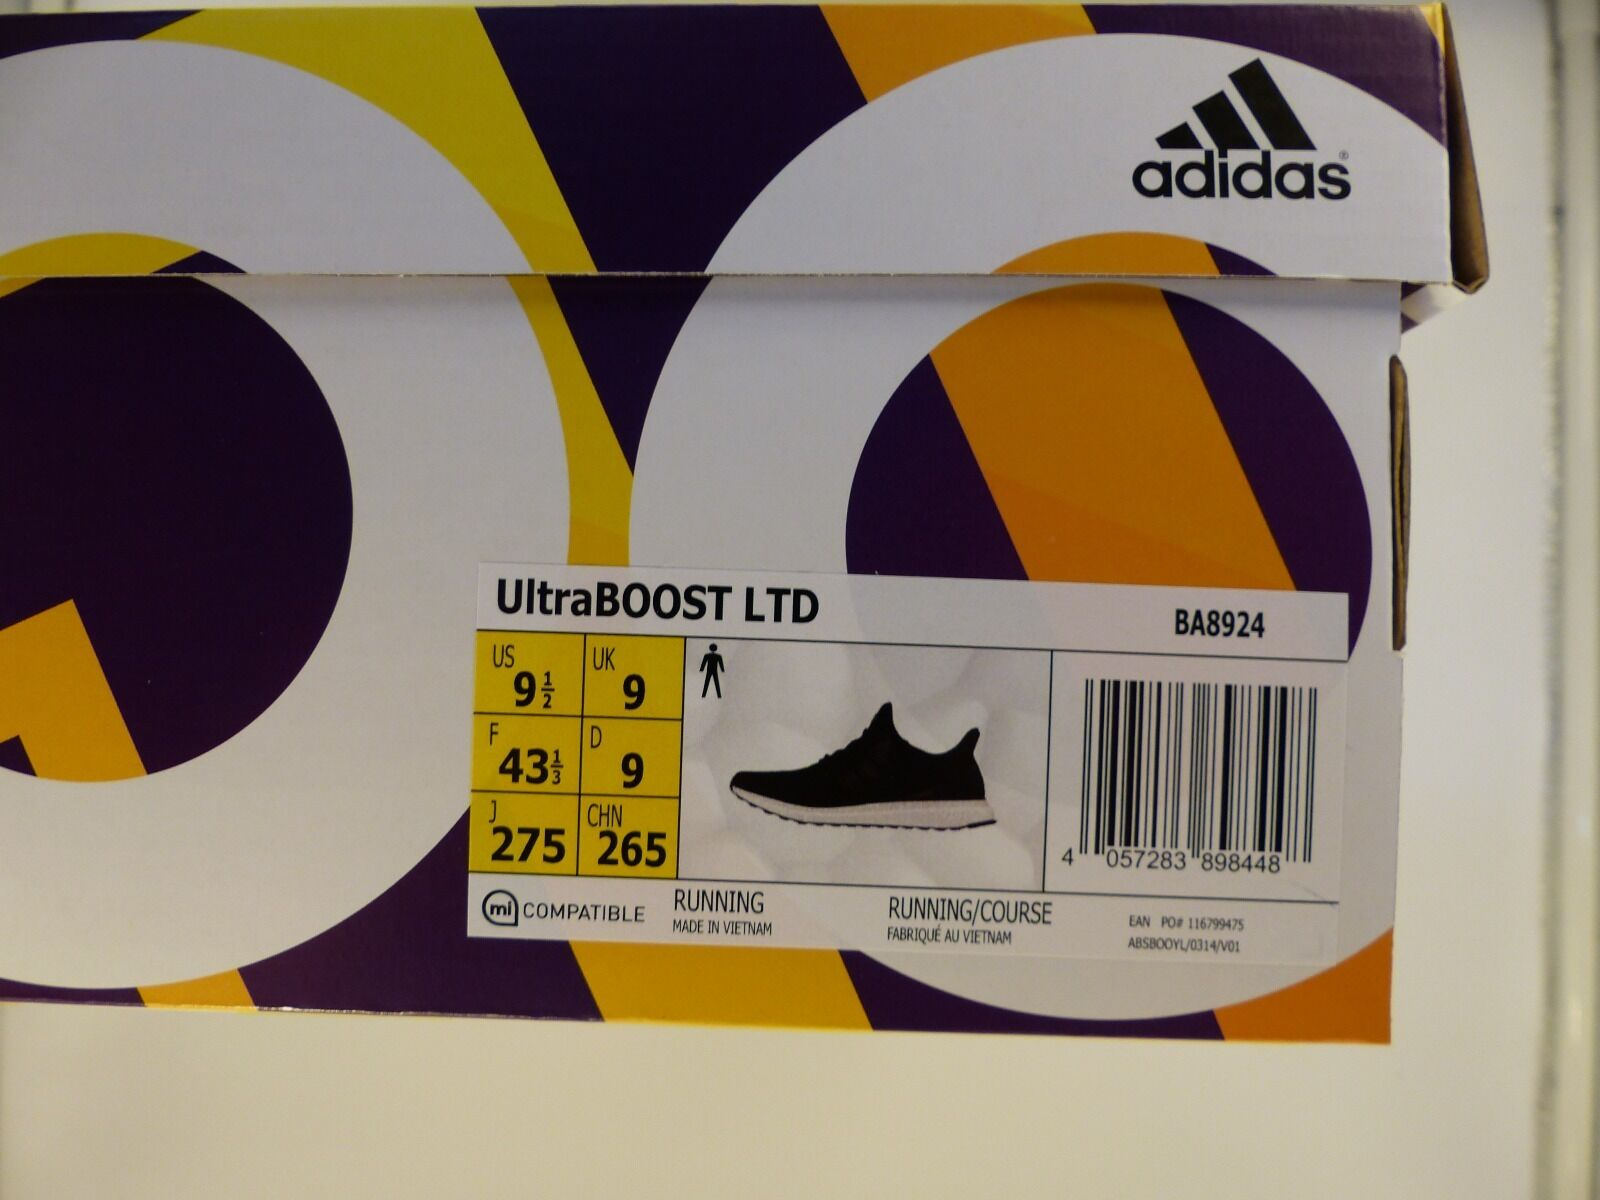 Adidas Ultra Boost LTD 3.0 3.0 3.0 Core Negro Cuero jaula UK9/US9.5/EU43 1/3 DS BA8924 0f2404